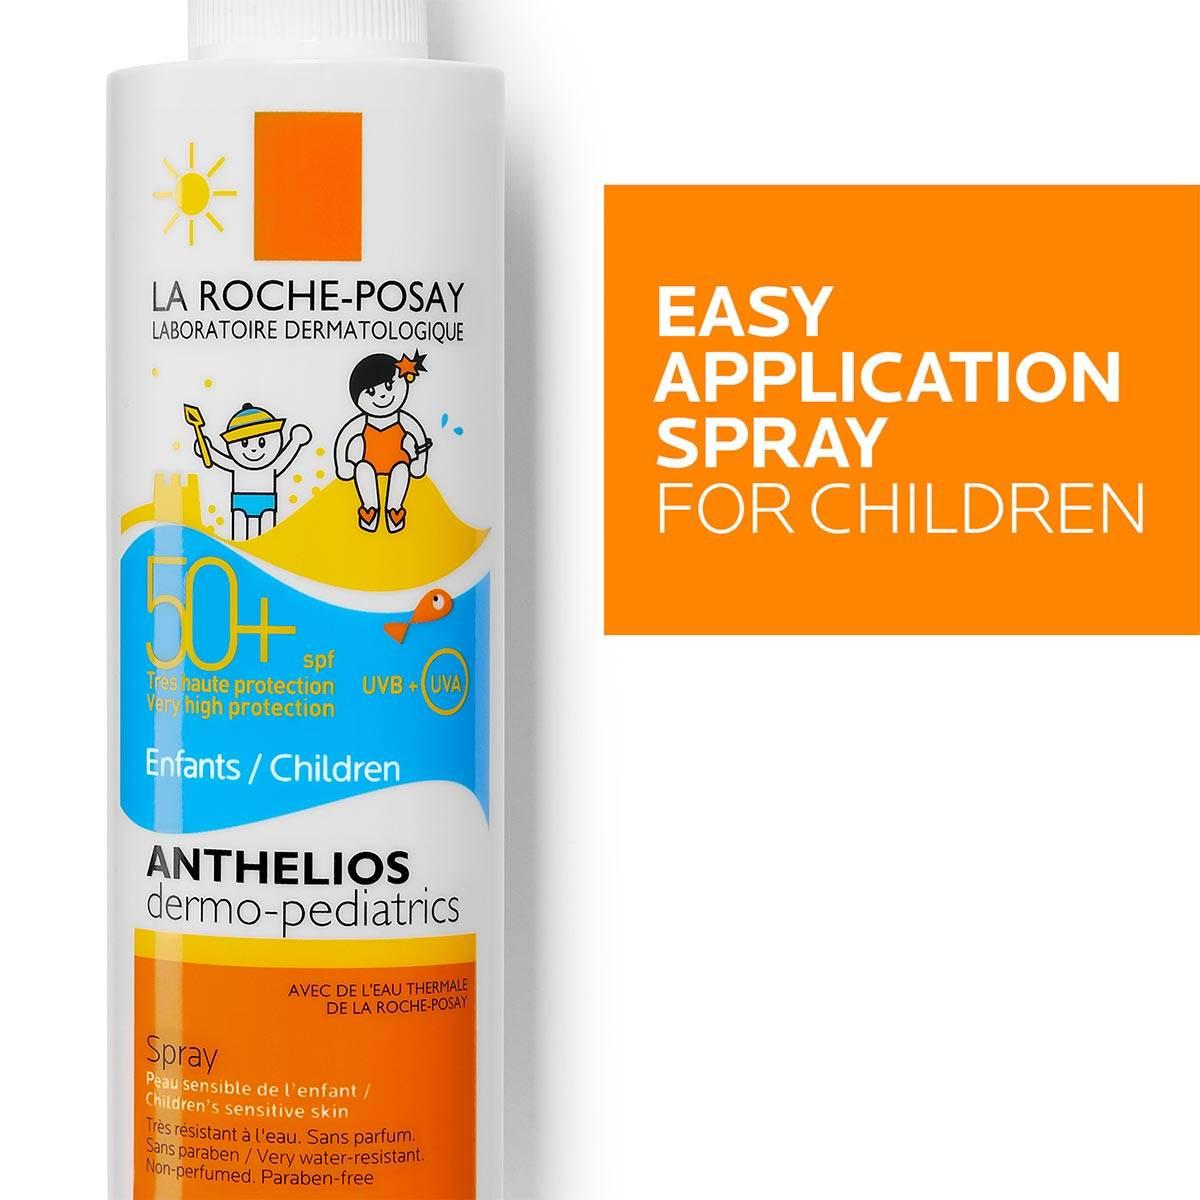 La Roche Posay Produktsida Sol Anthelios DP Spray Spf50 200ml 33378724